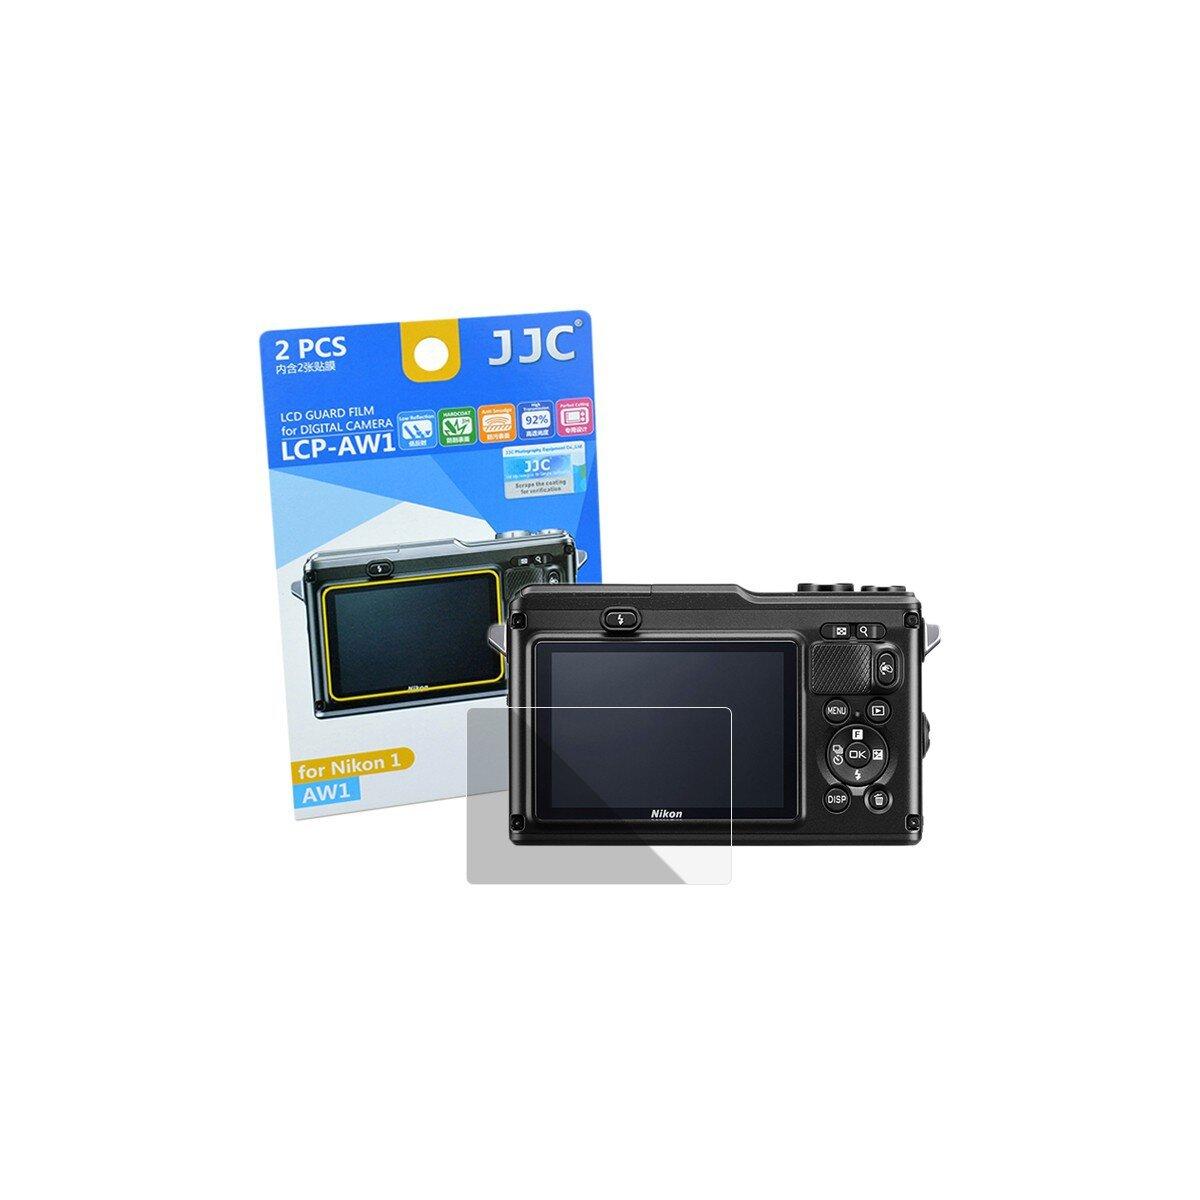 JJC Displayschutzfolie Screen Protector Kratzschutz passgenau kompatibel für Nikon AW1 - LCP-AW1